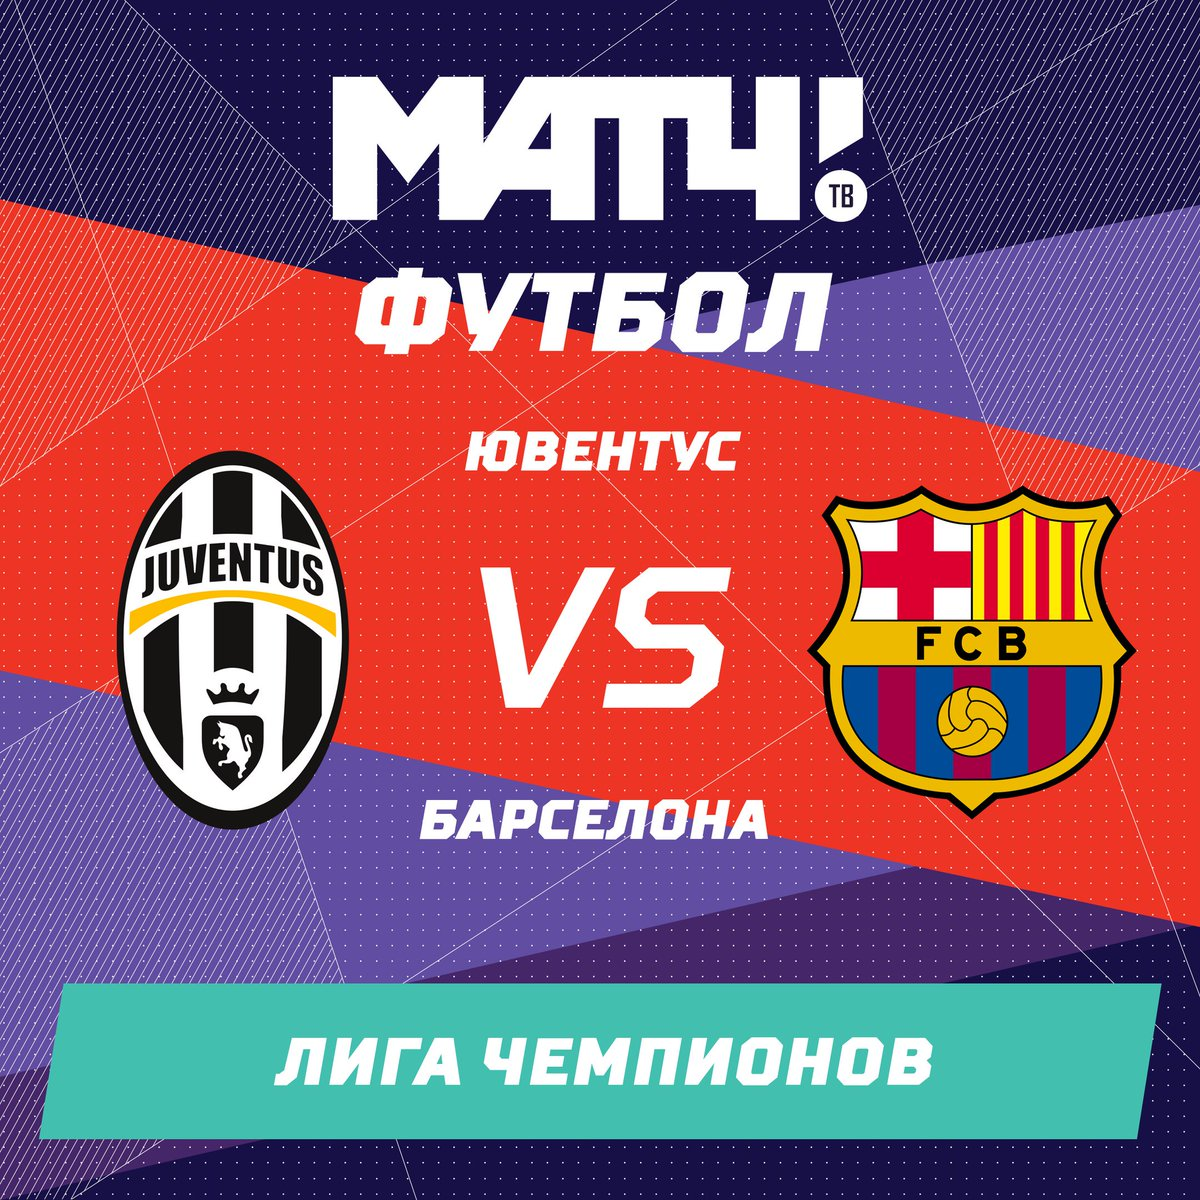 Футбол лига чемпионов ювентус барселона онлайн